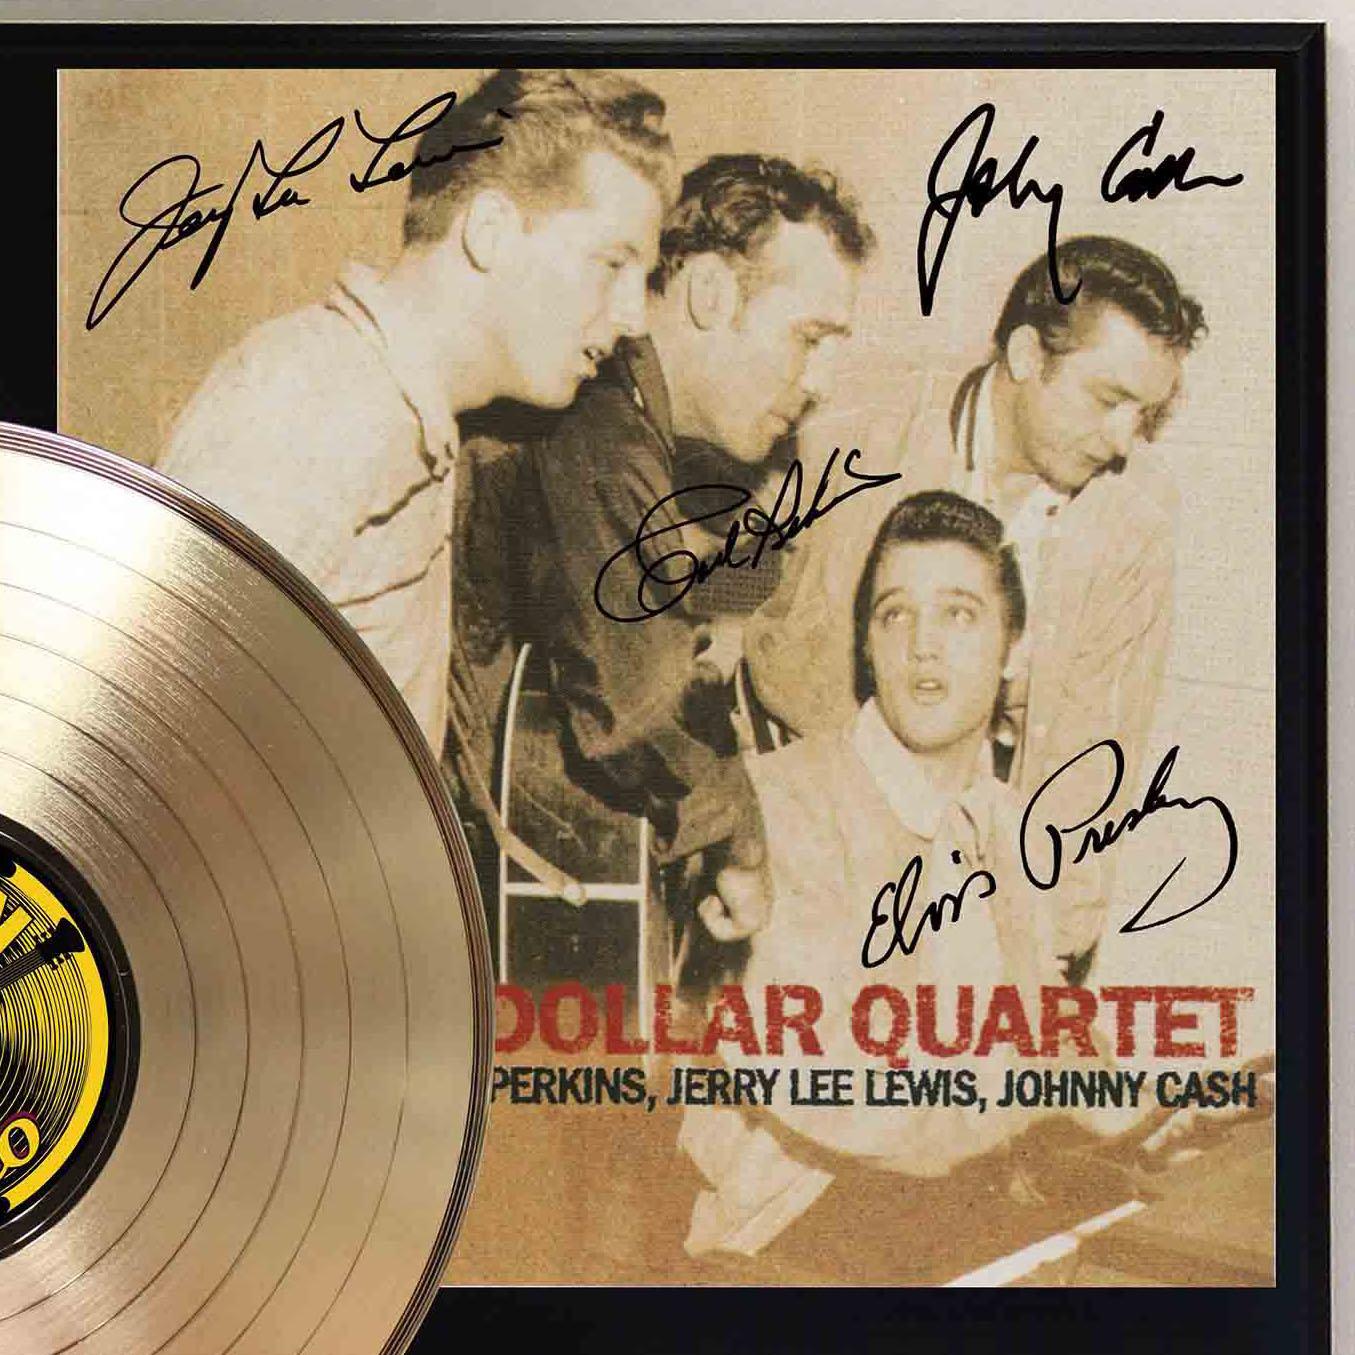 Million Dollar Quartet Gold LP Record